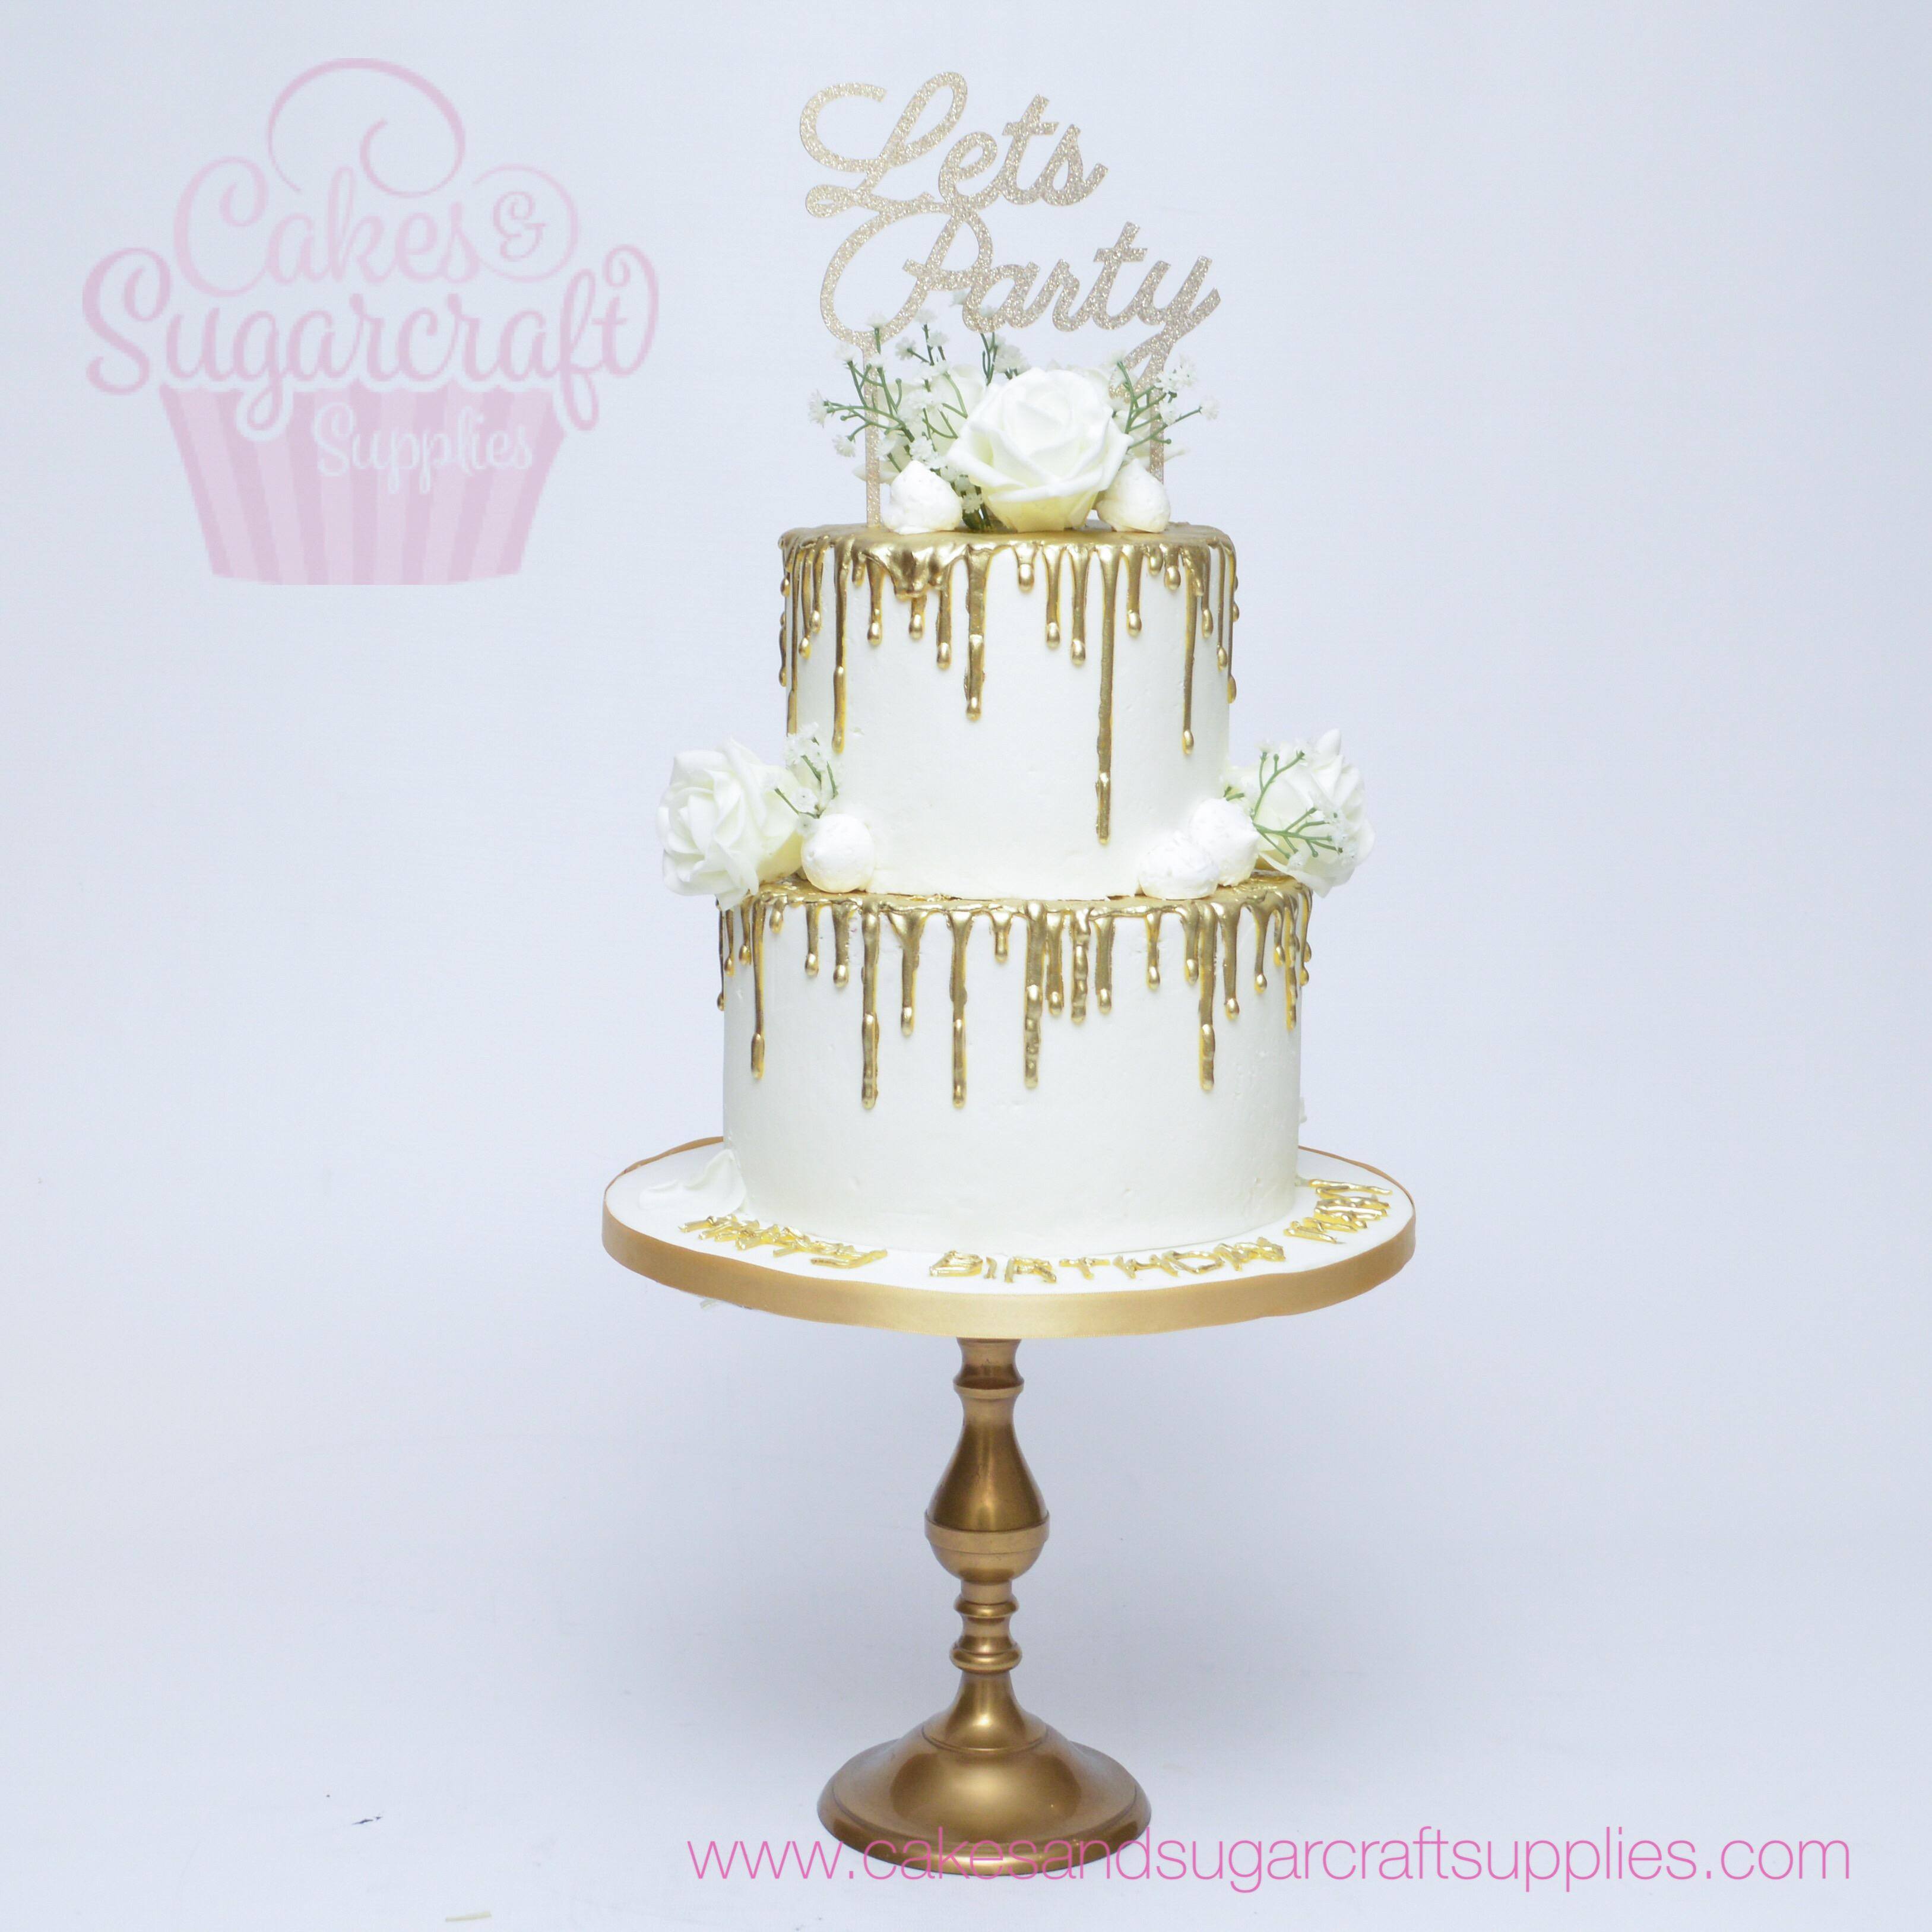 Wedding Cakes - Cakes & Sugarcraft Supplies